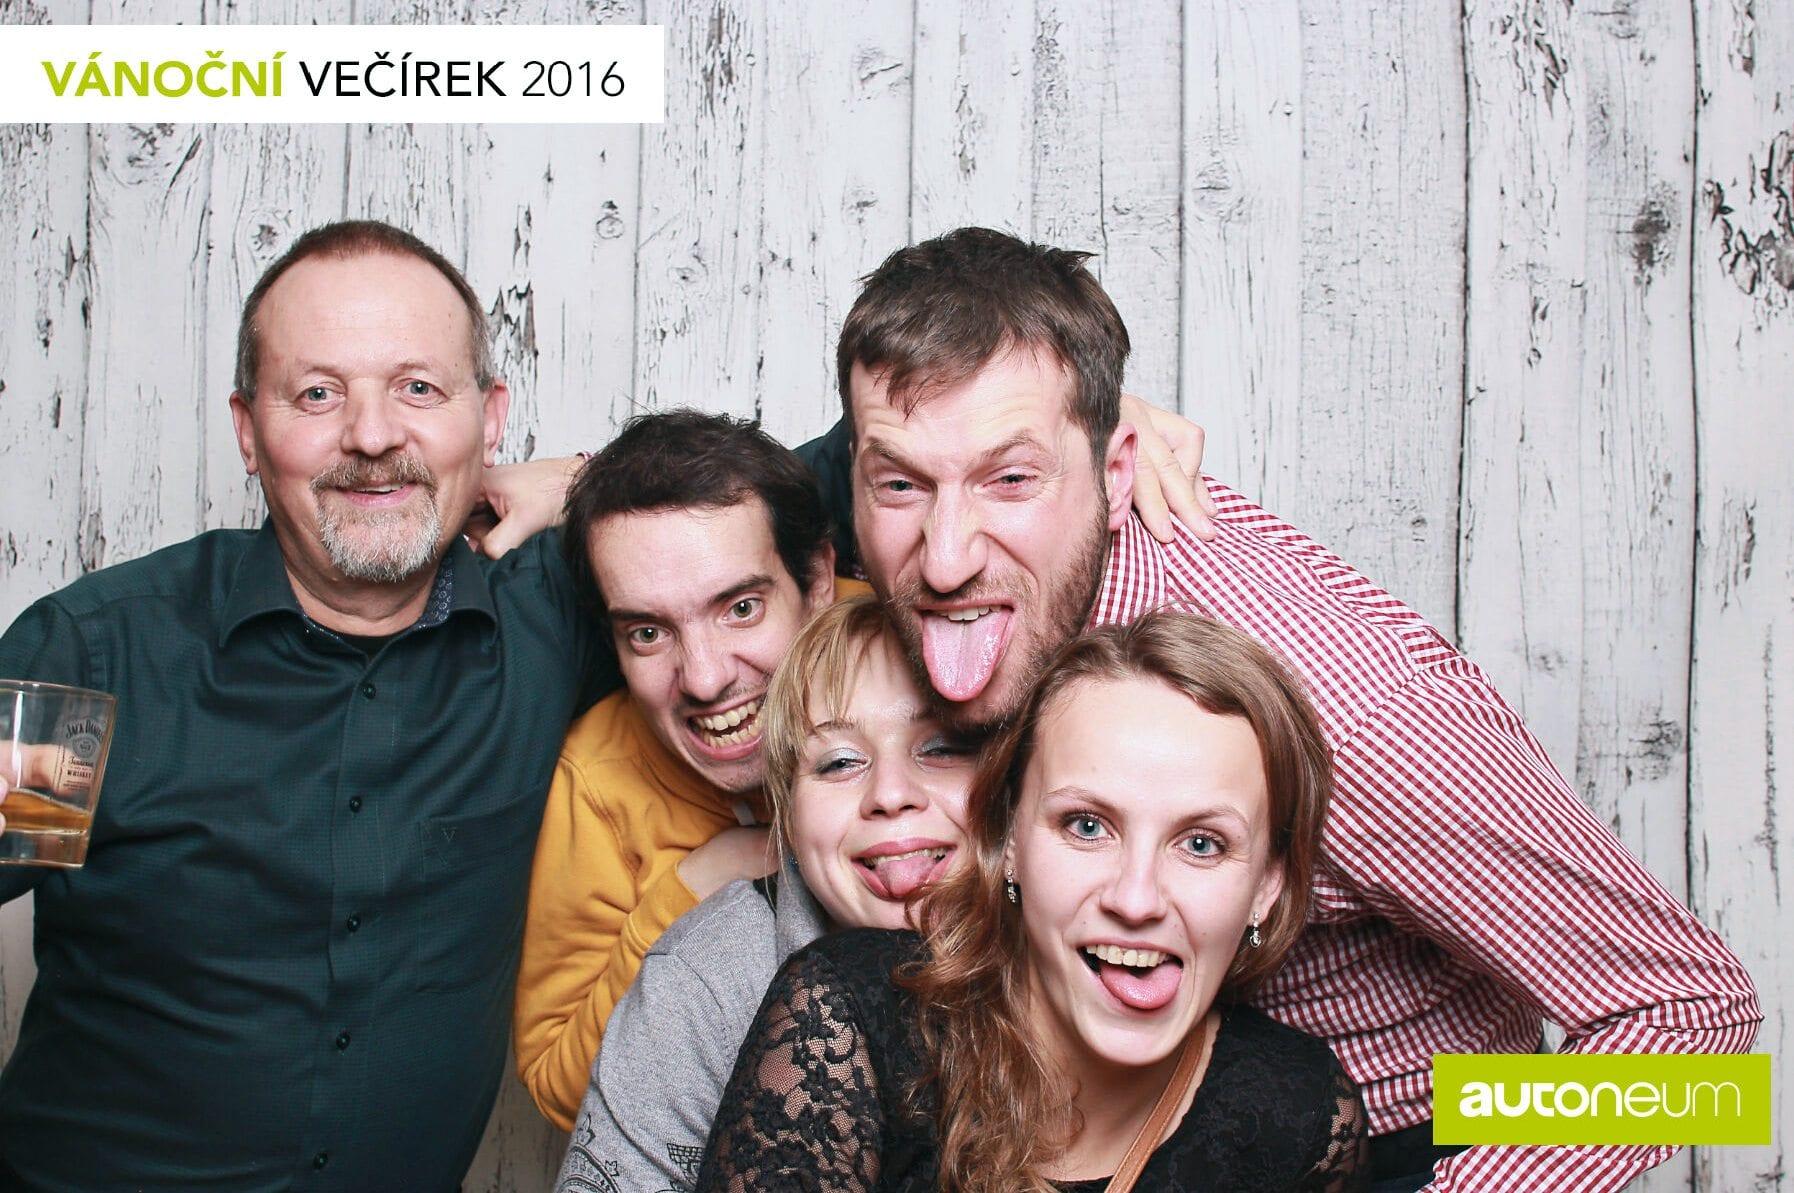 fotokoutek-autoneum-25-11-2016-163577